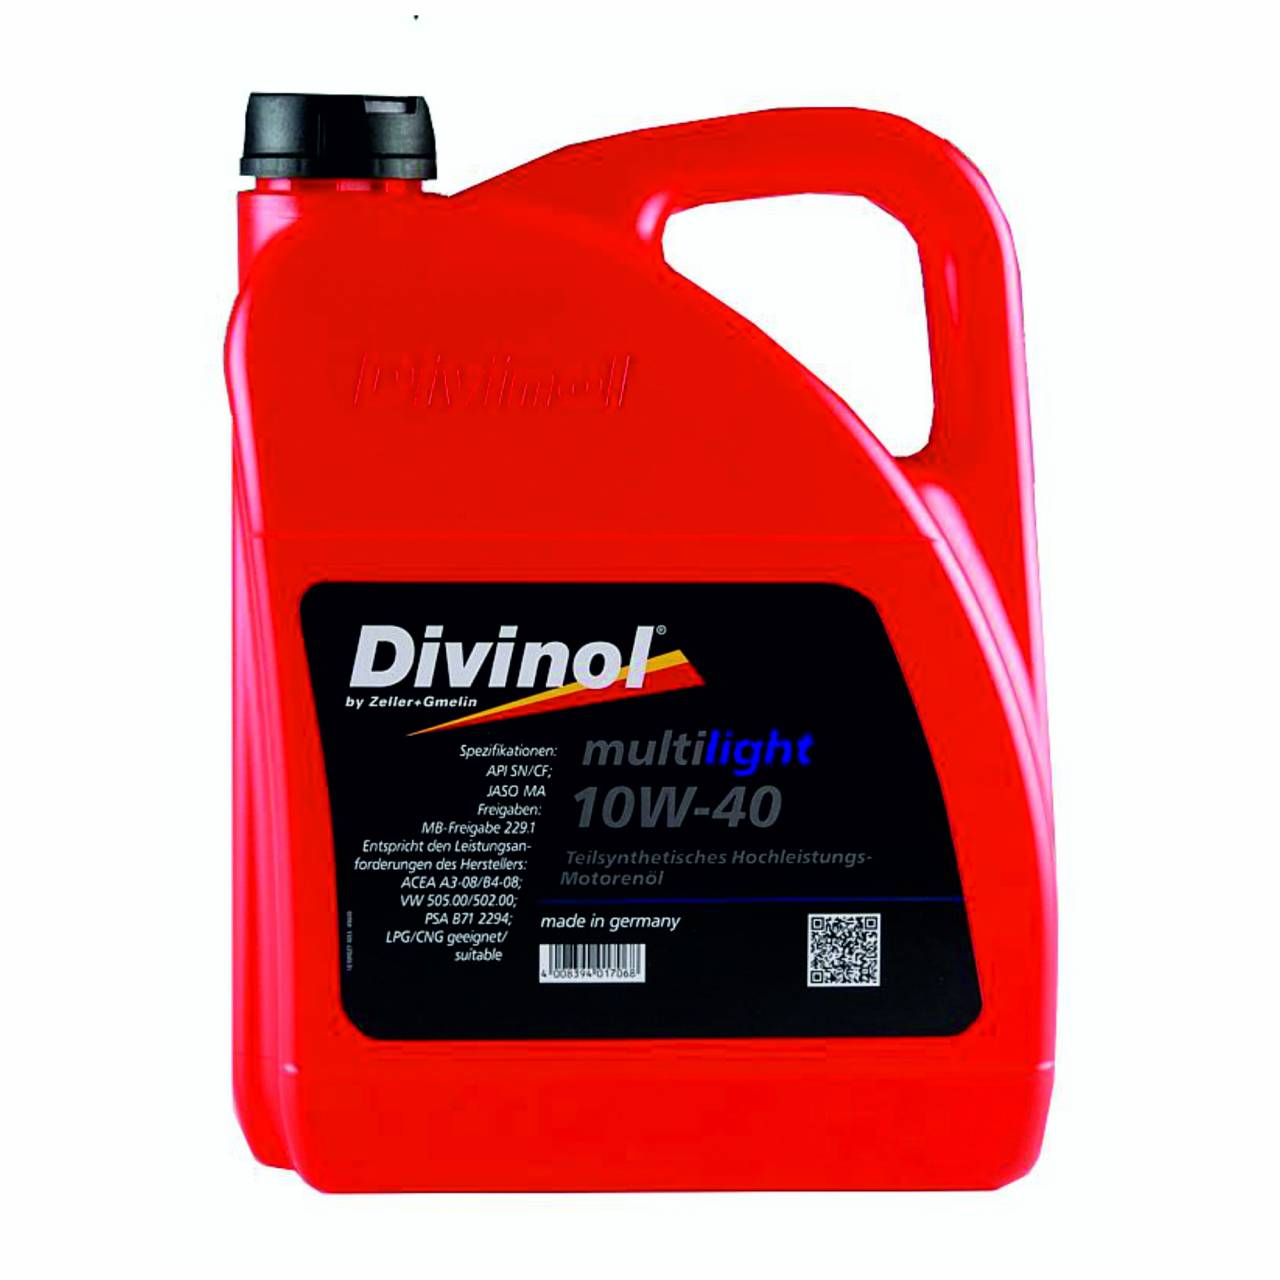 Motorenöl 'Divinol' Multilight 10W-40 / 5,0 Liter Kanister